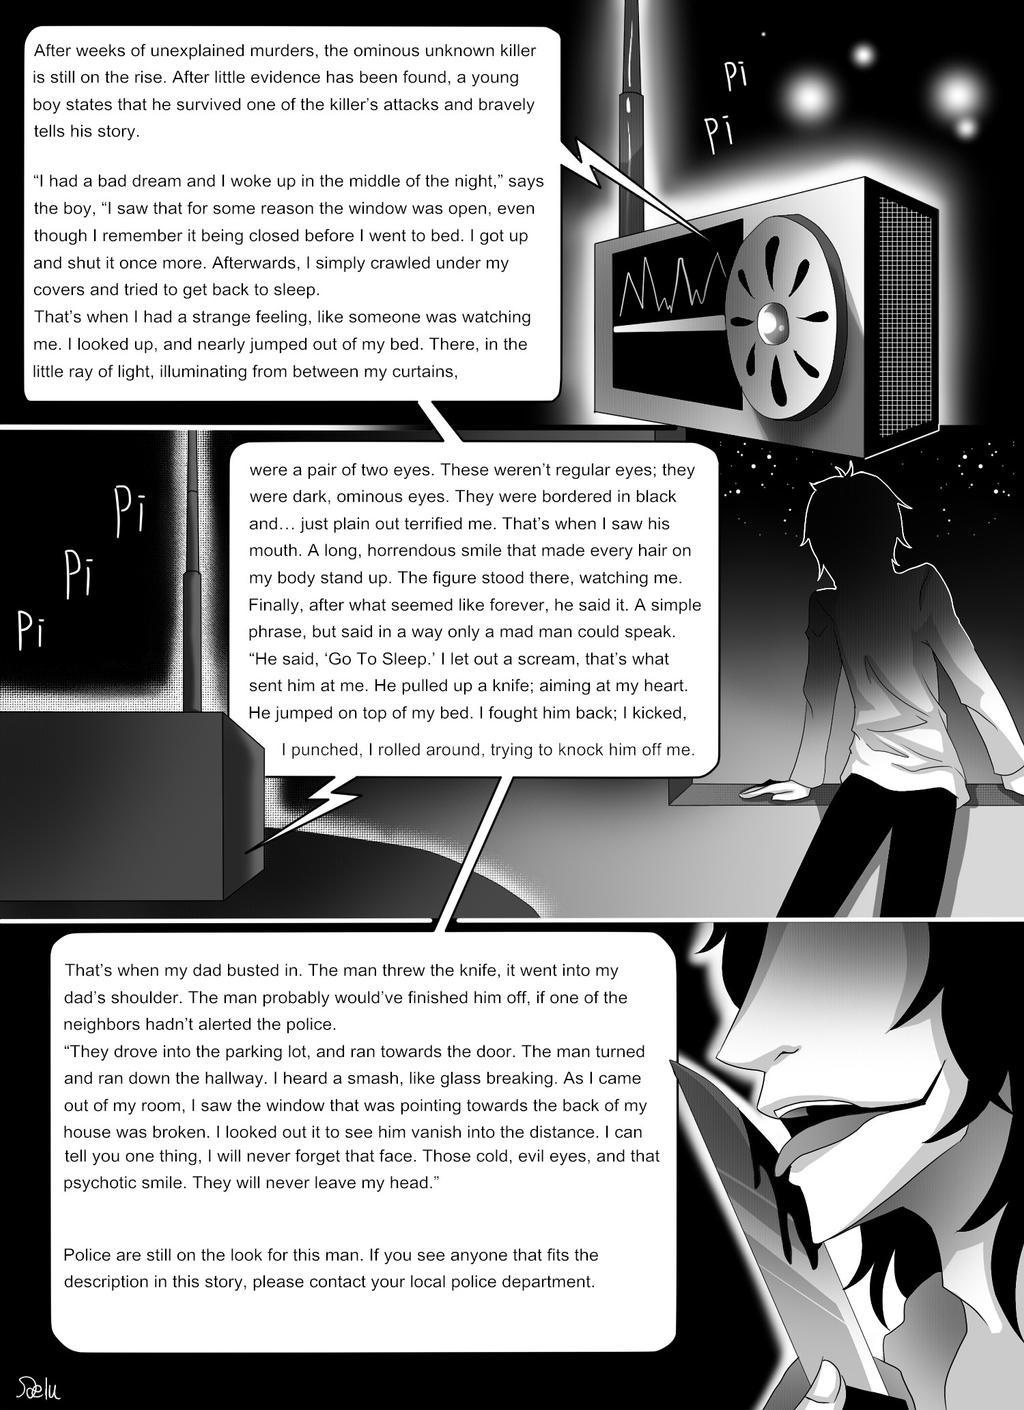 Jeff the killer story